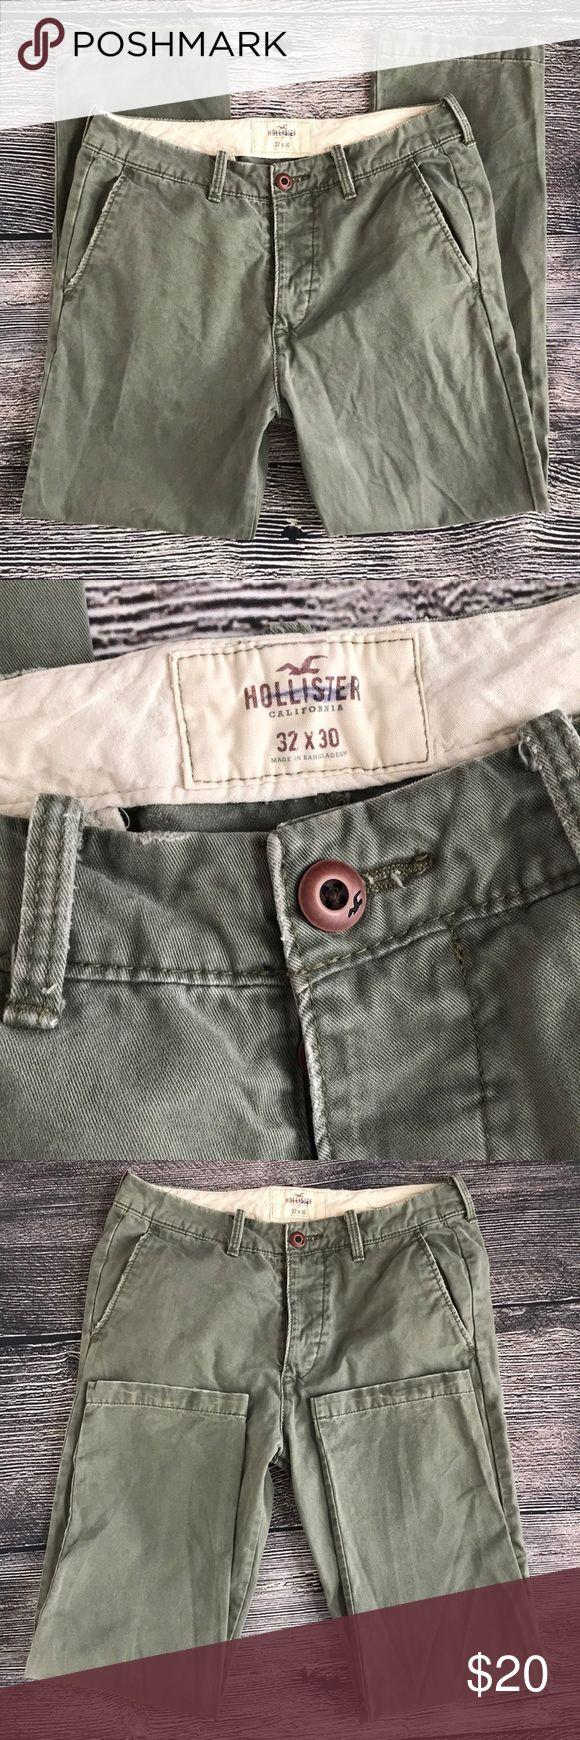 Hollister olive green 32 x 30 100% pants Hollister California 32 x 30 may have Bangladesh. Olive green slacks with front pockets, back pockets, belt loops. Hollister Pants Trousers